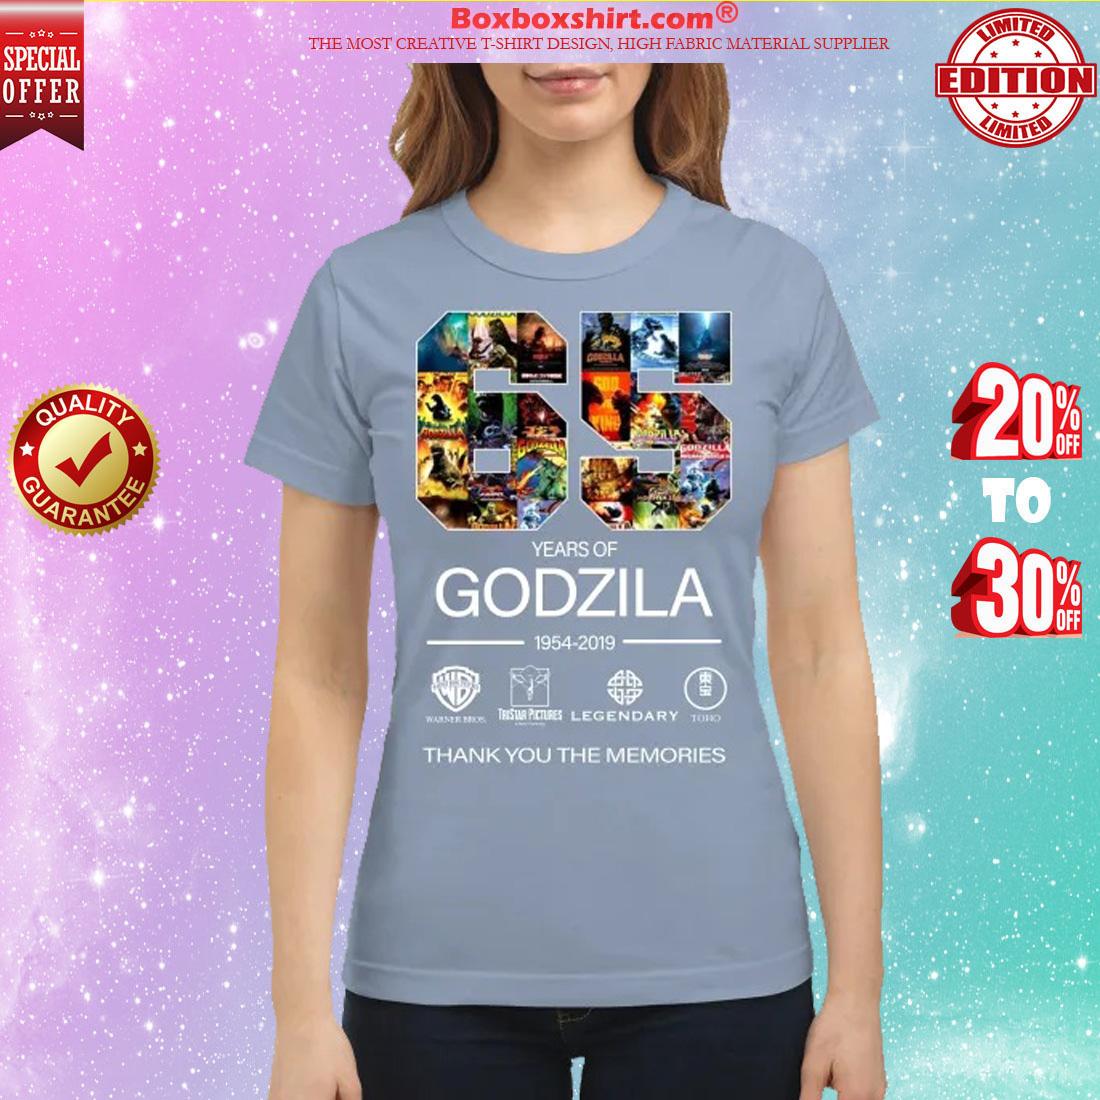 65 year of Godzila thank you the memories classic shirt